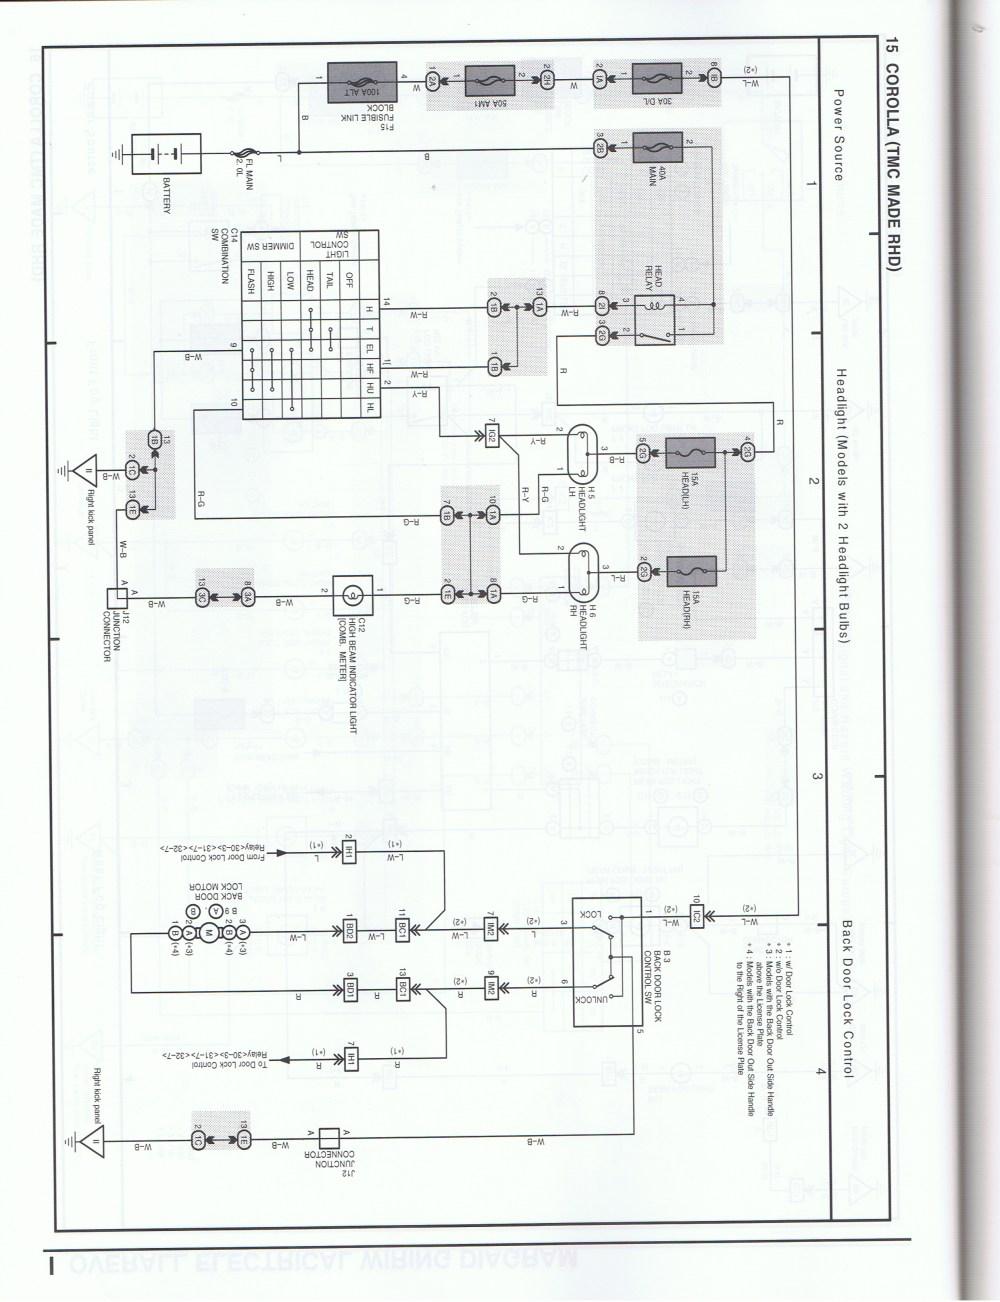 medium resolution of acura rsx o2 sensor wiring diagram nerv rh yunerv blogspot com 2004 acura rsx sensor diagram 2003 acura rsx sensor diagram